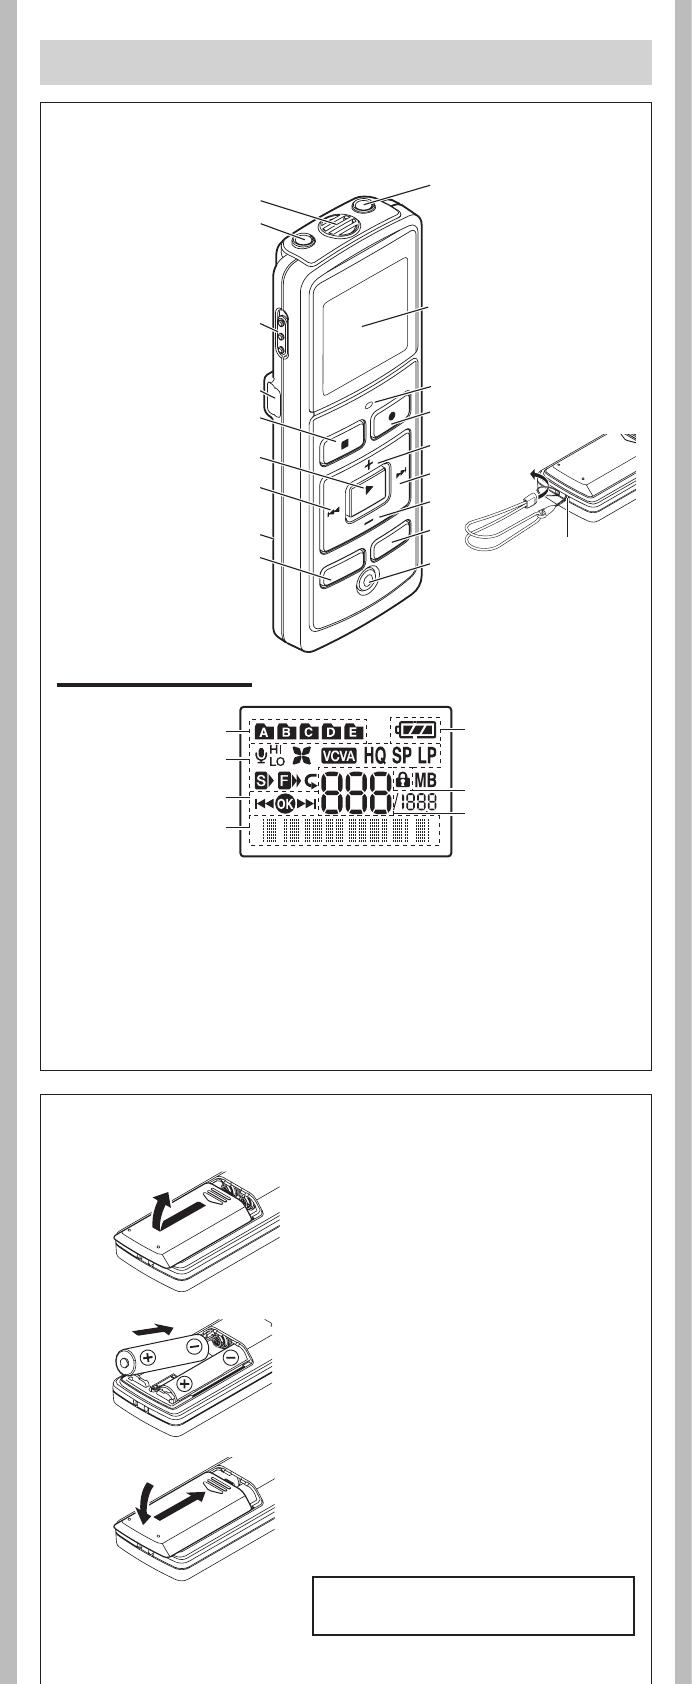 Handleiding Olympus VN-5500PC (pagina 2 van 12) (Nederlands)